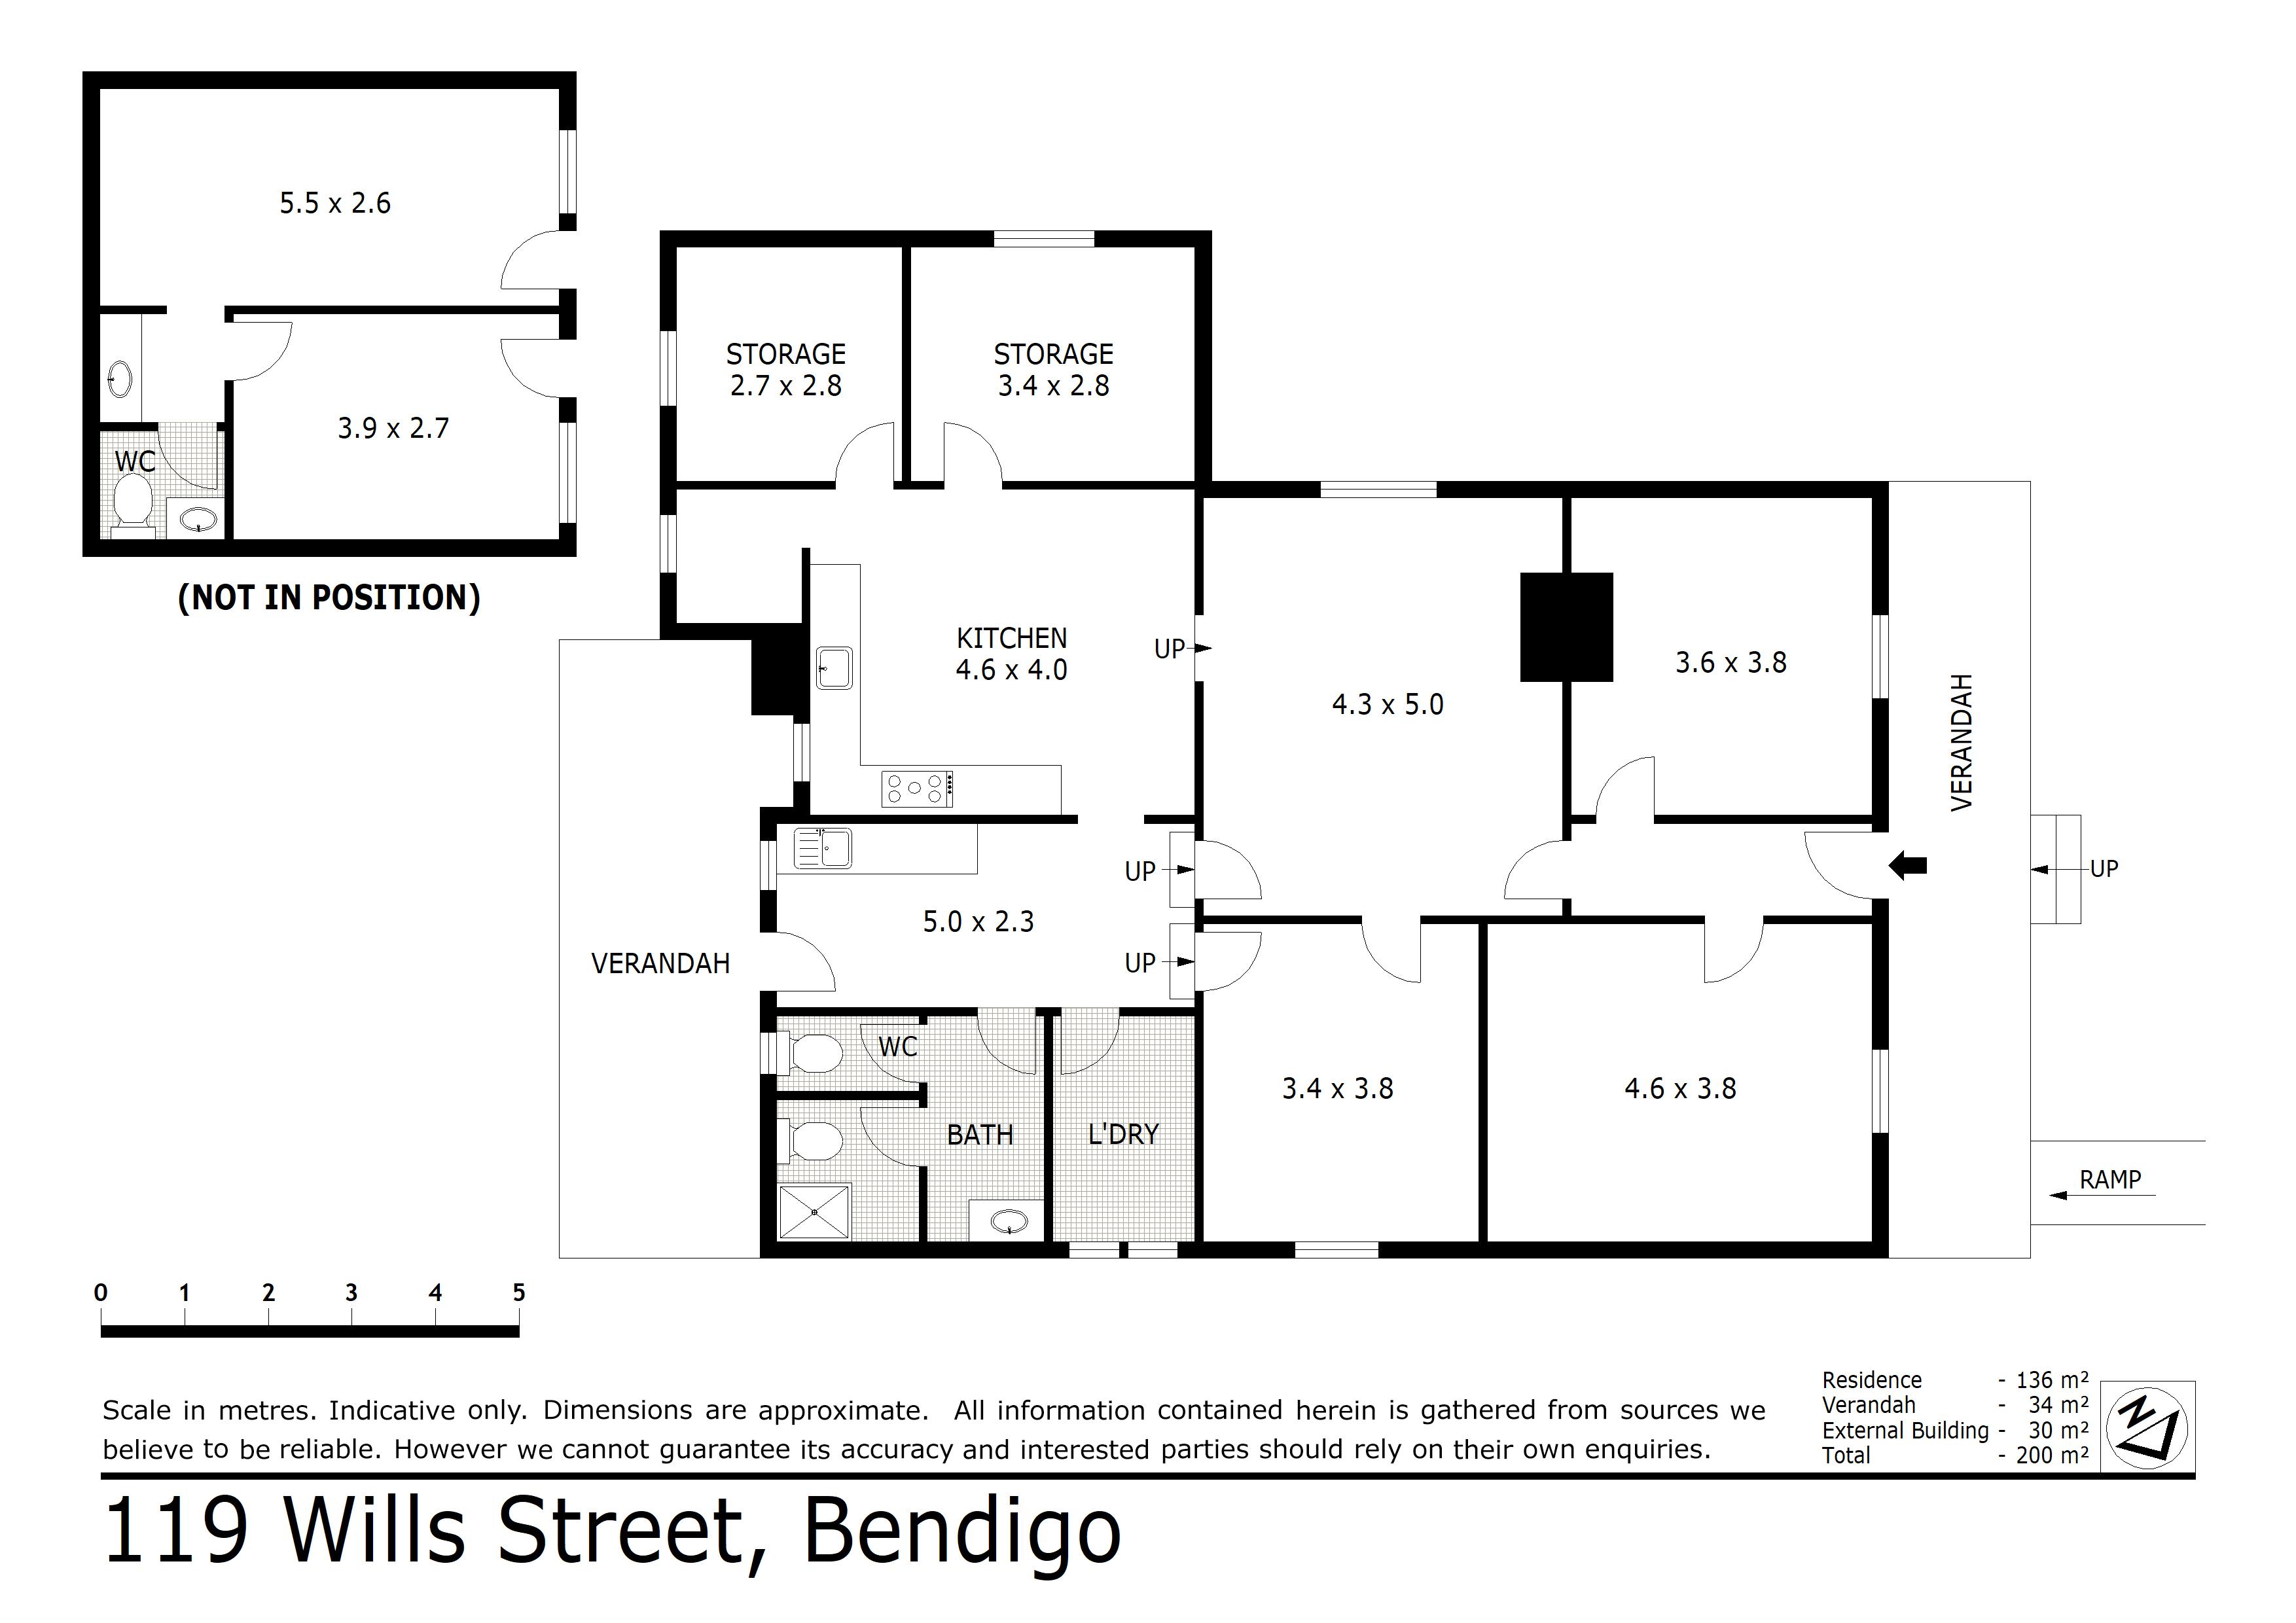 119 Wills Street, Bendigo, VIC 3550